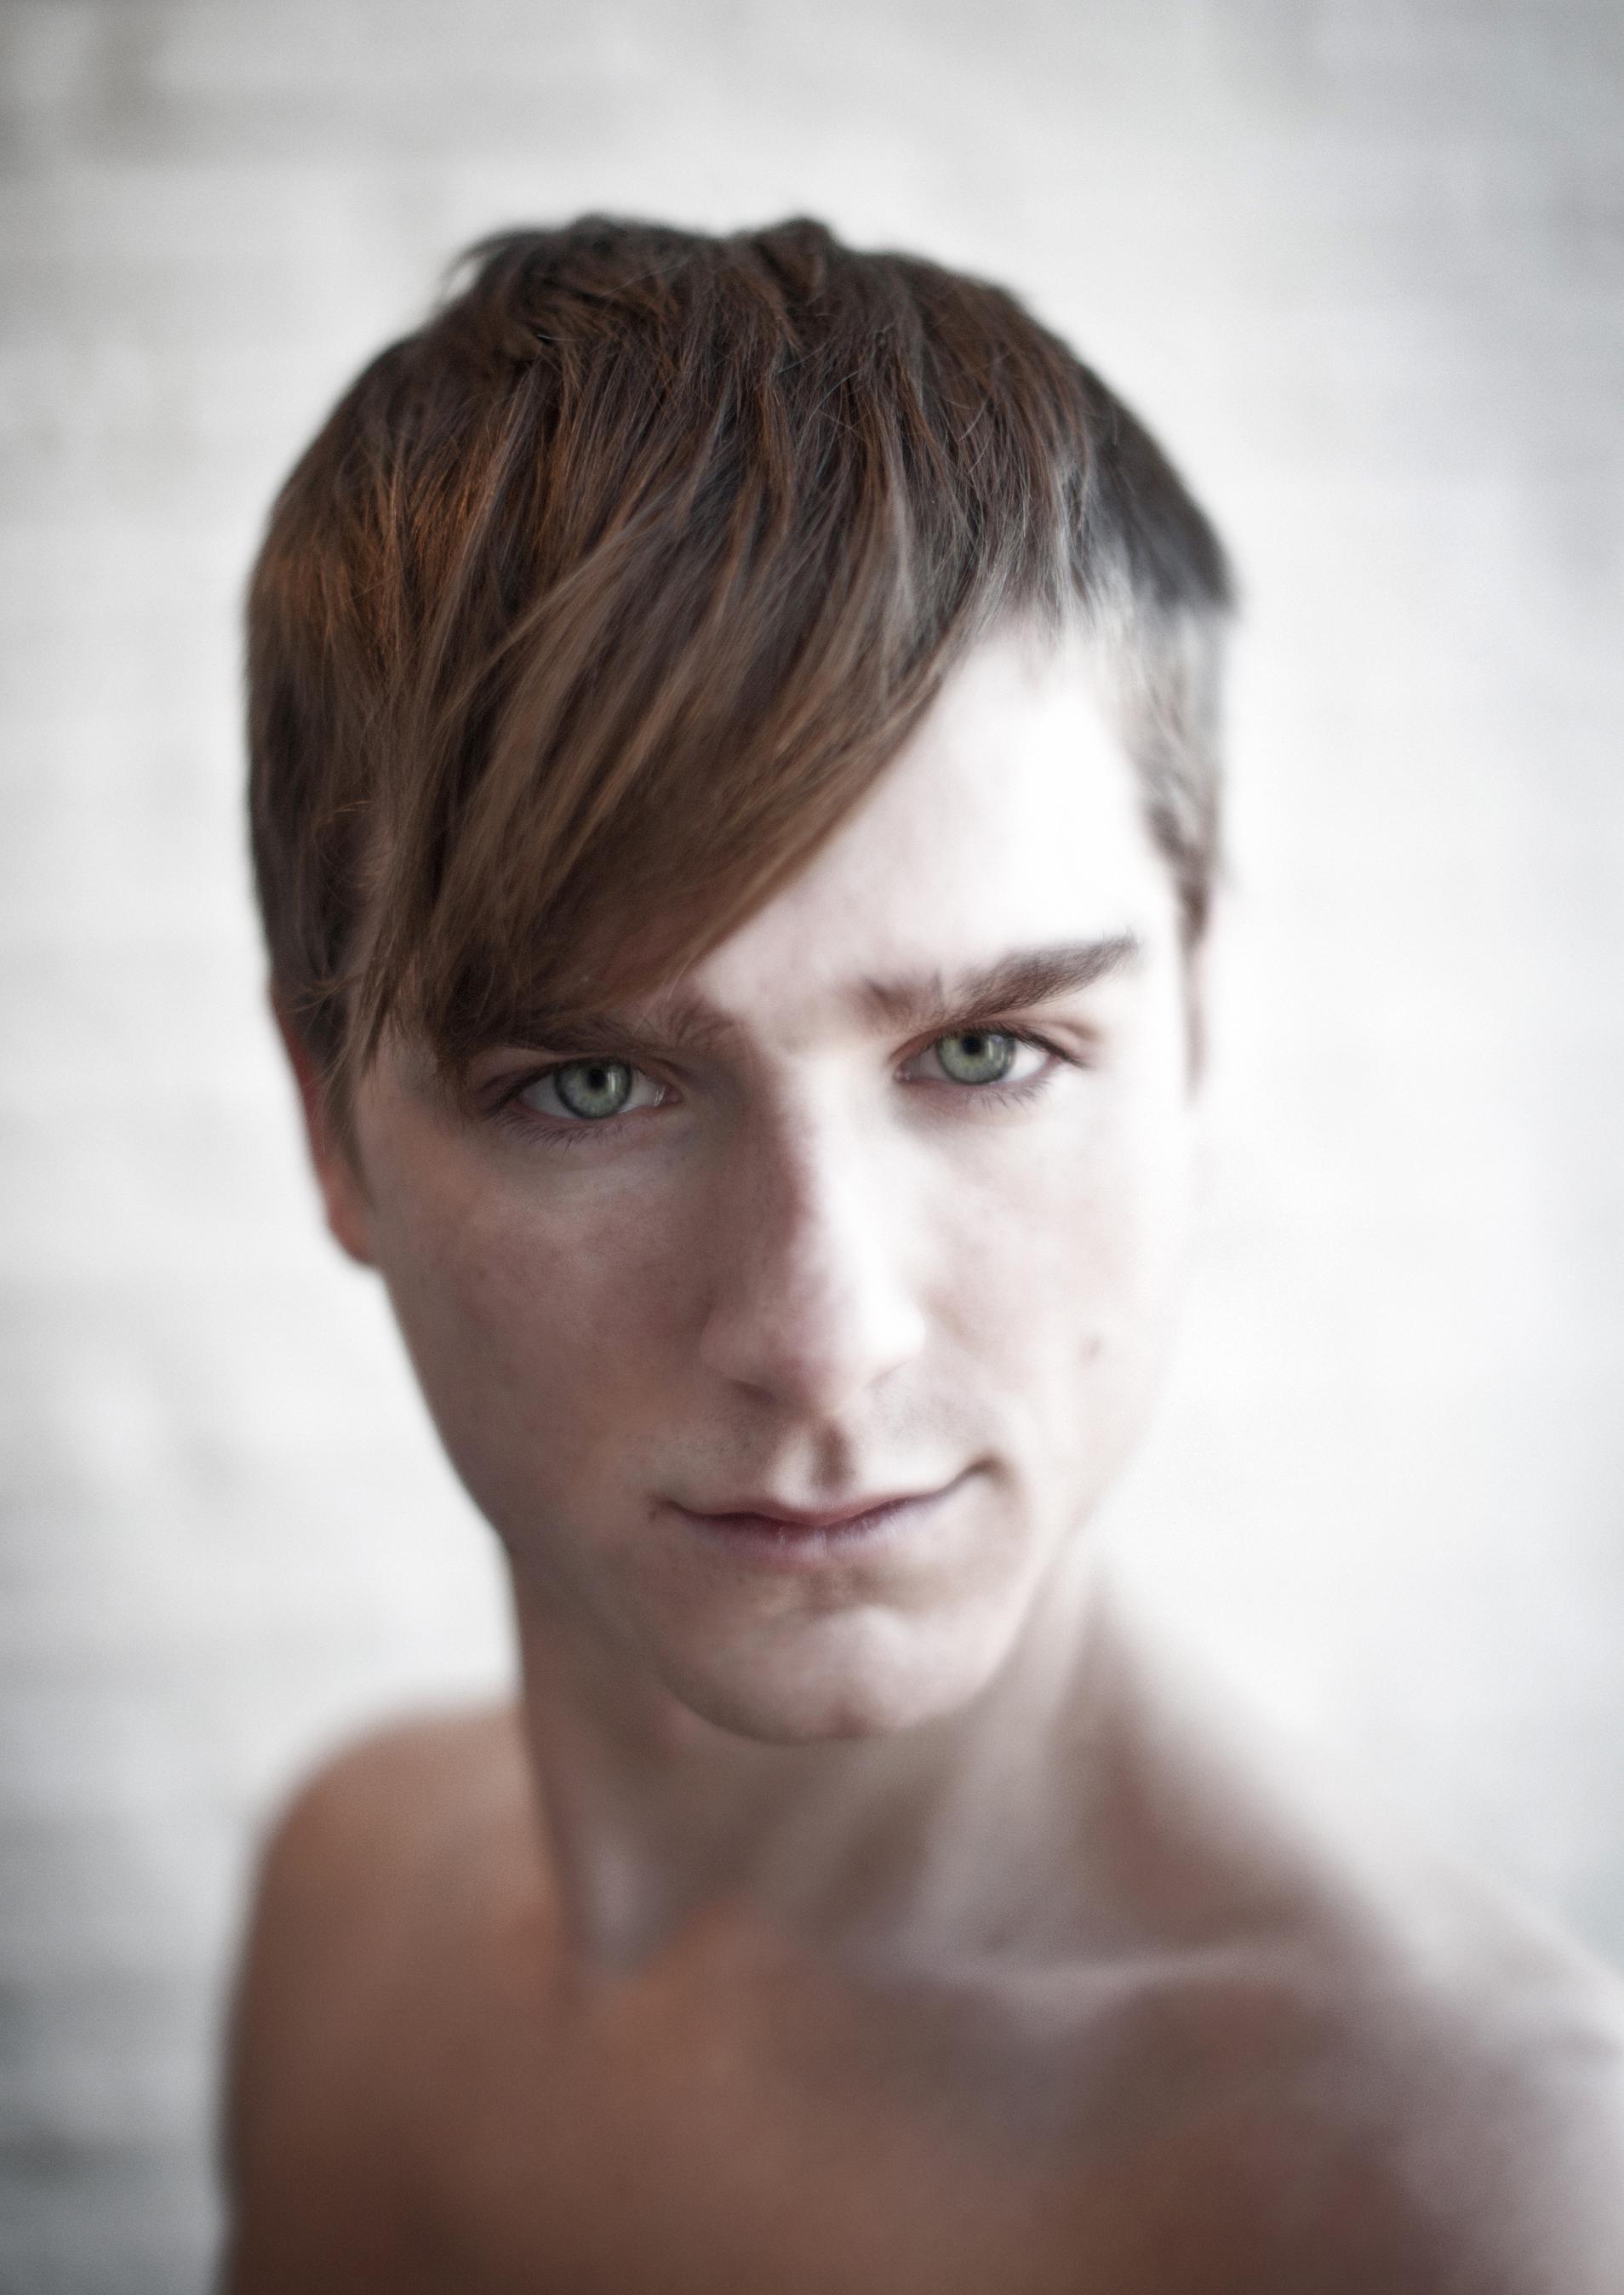 Het Portret Van Dorian Gray Mattias Van De Vijver